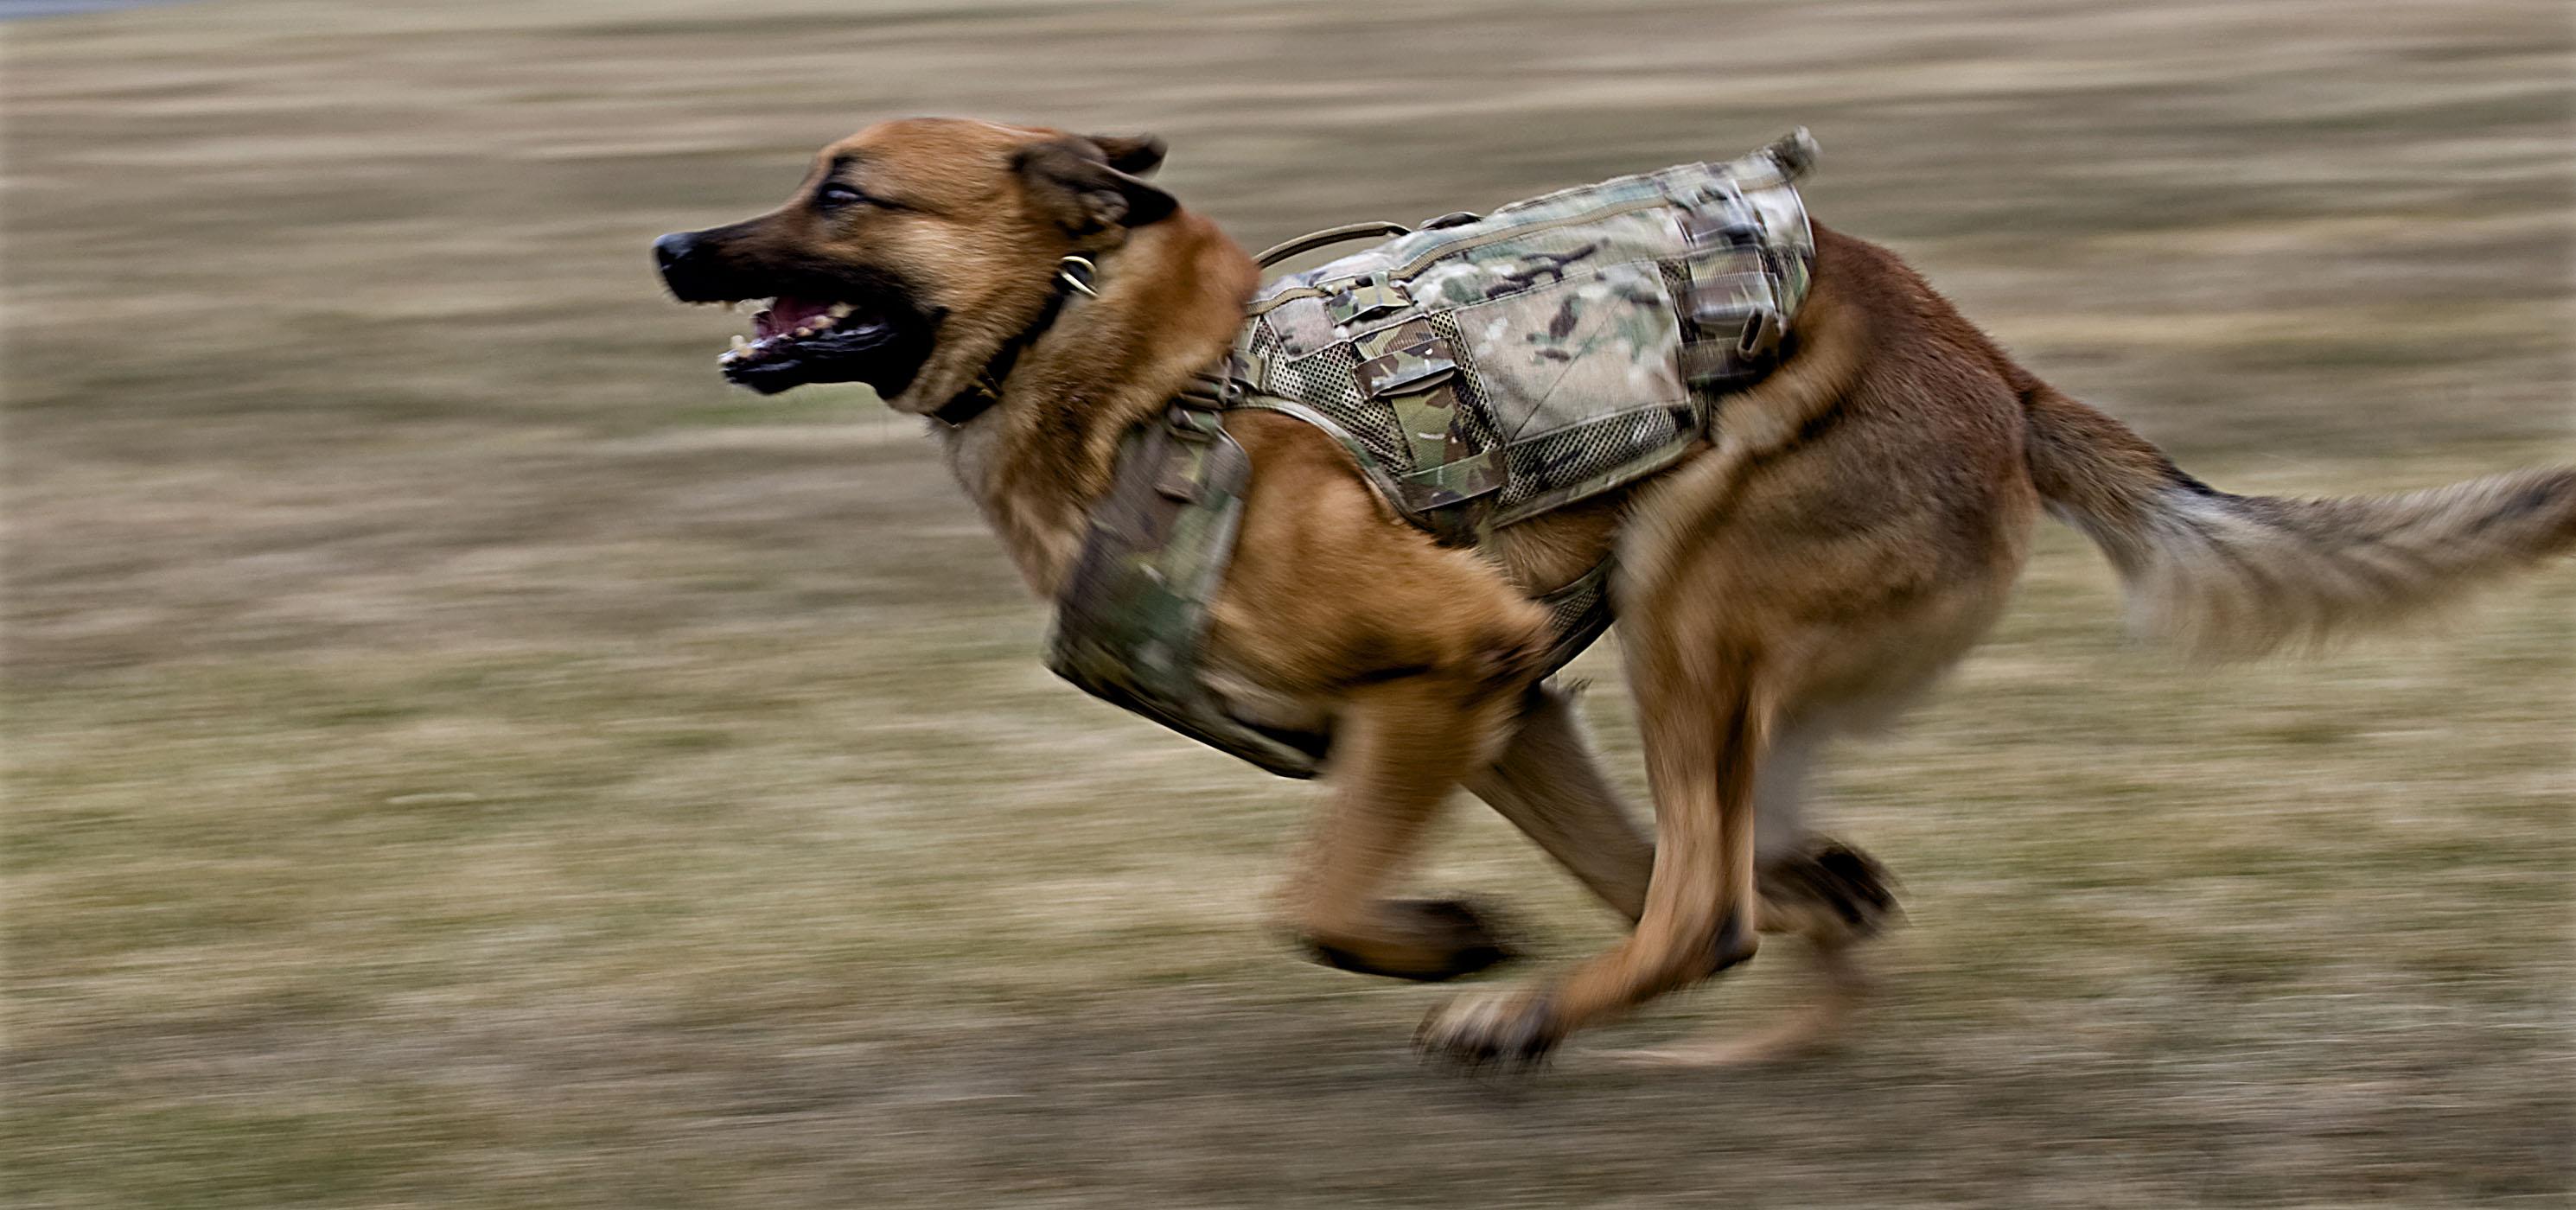 How To Make A Dog Life Vest